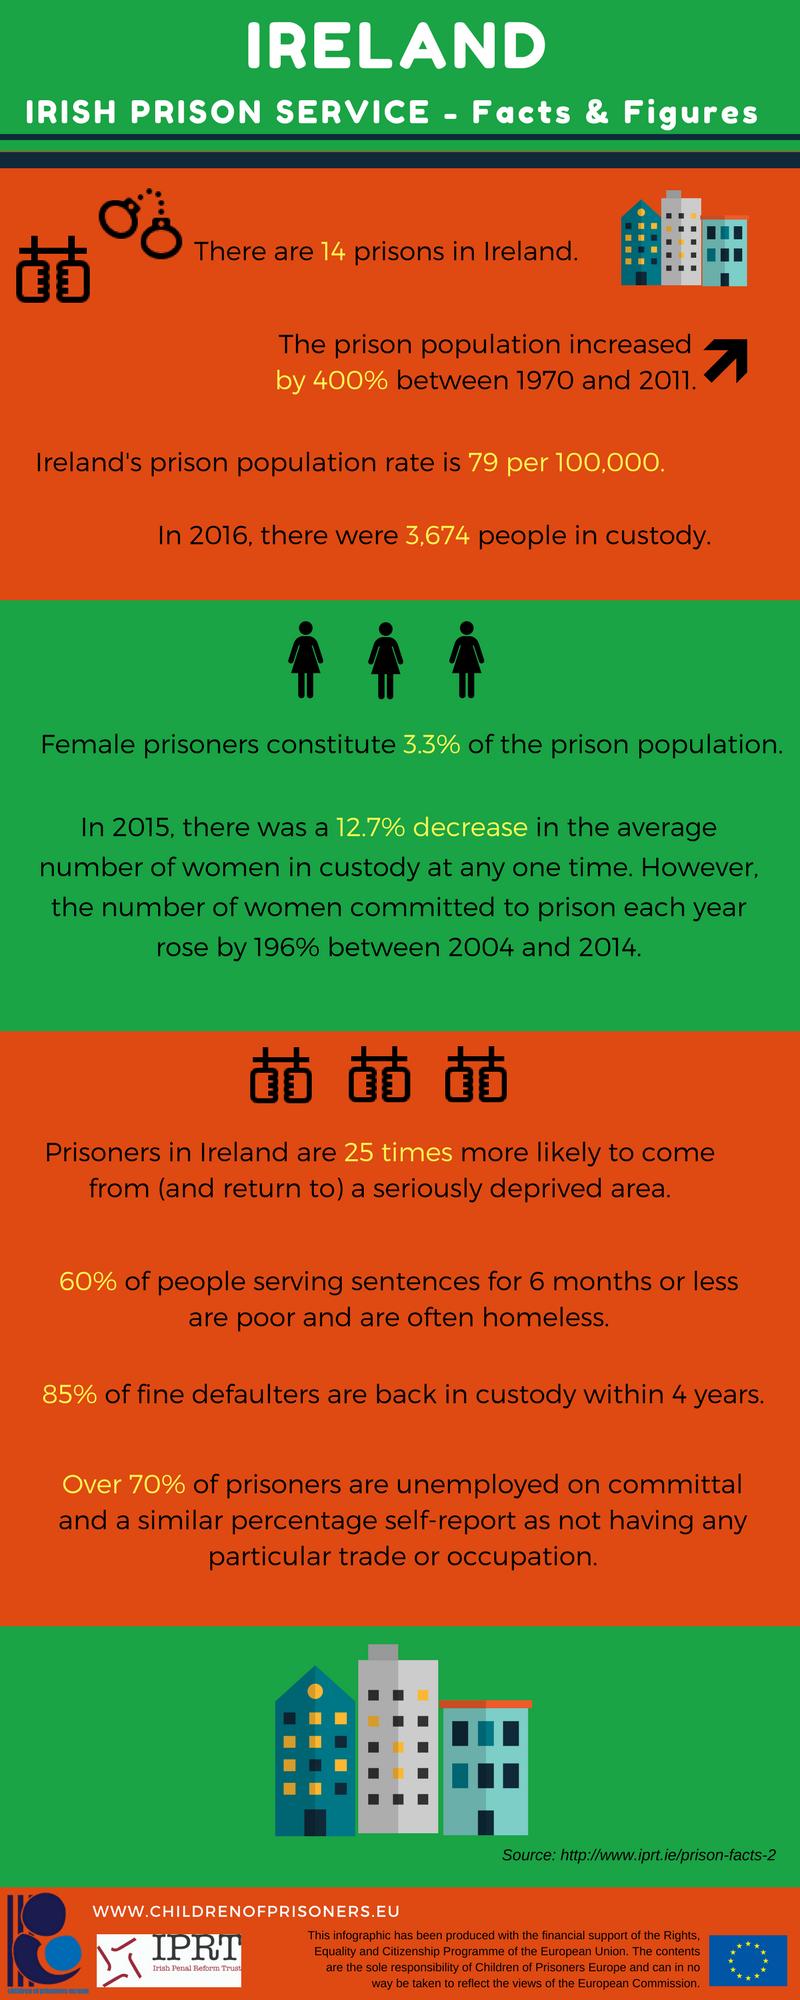 Statistics Ireland | Children of prisoners